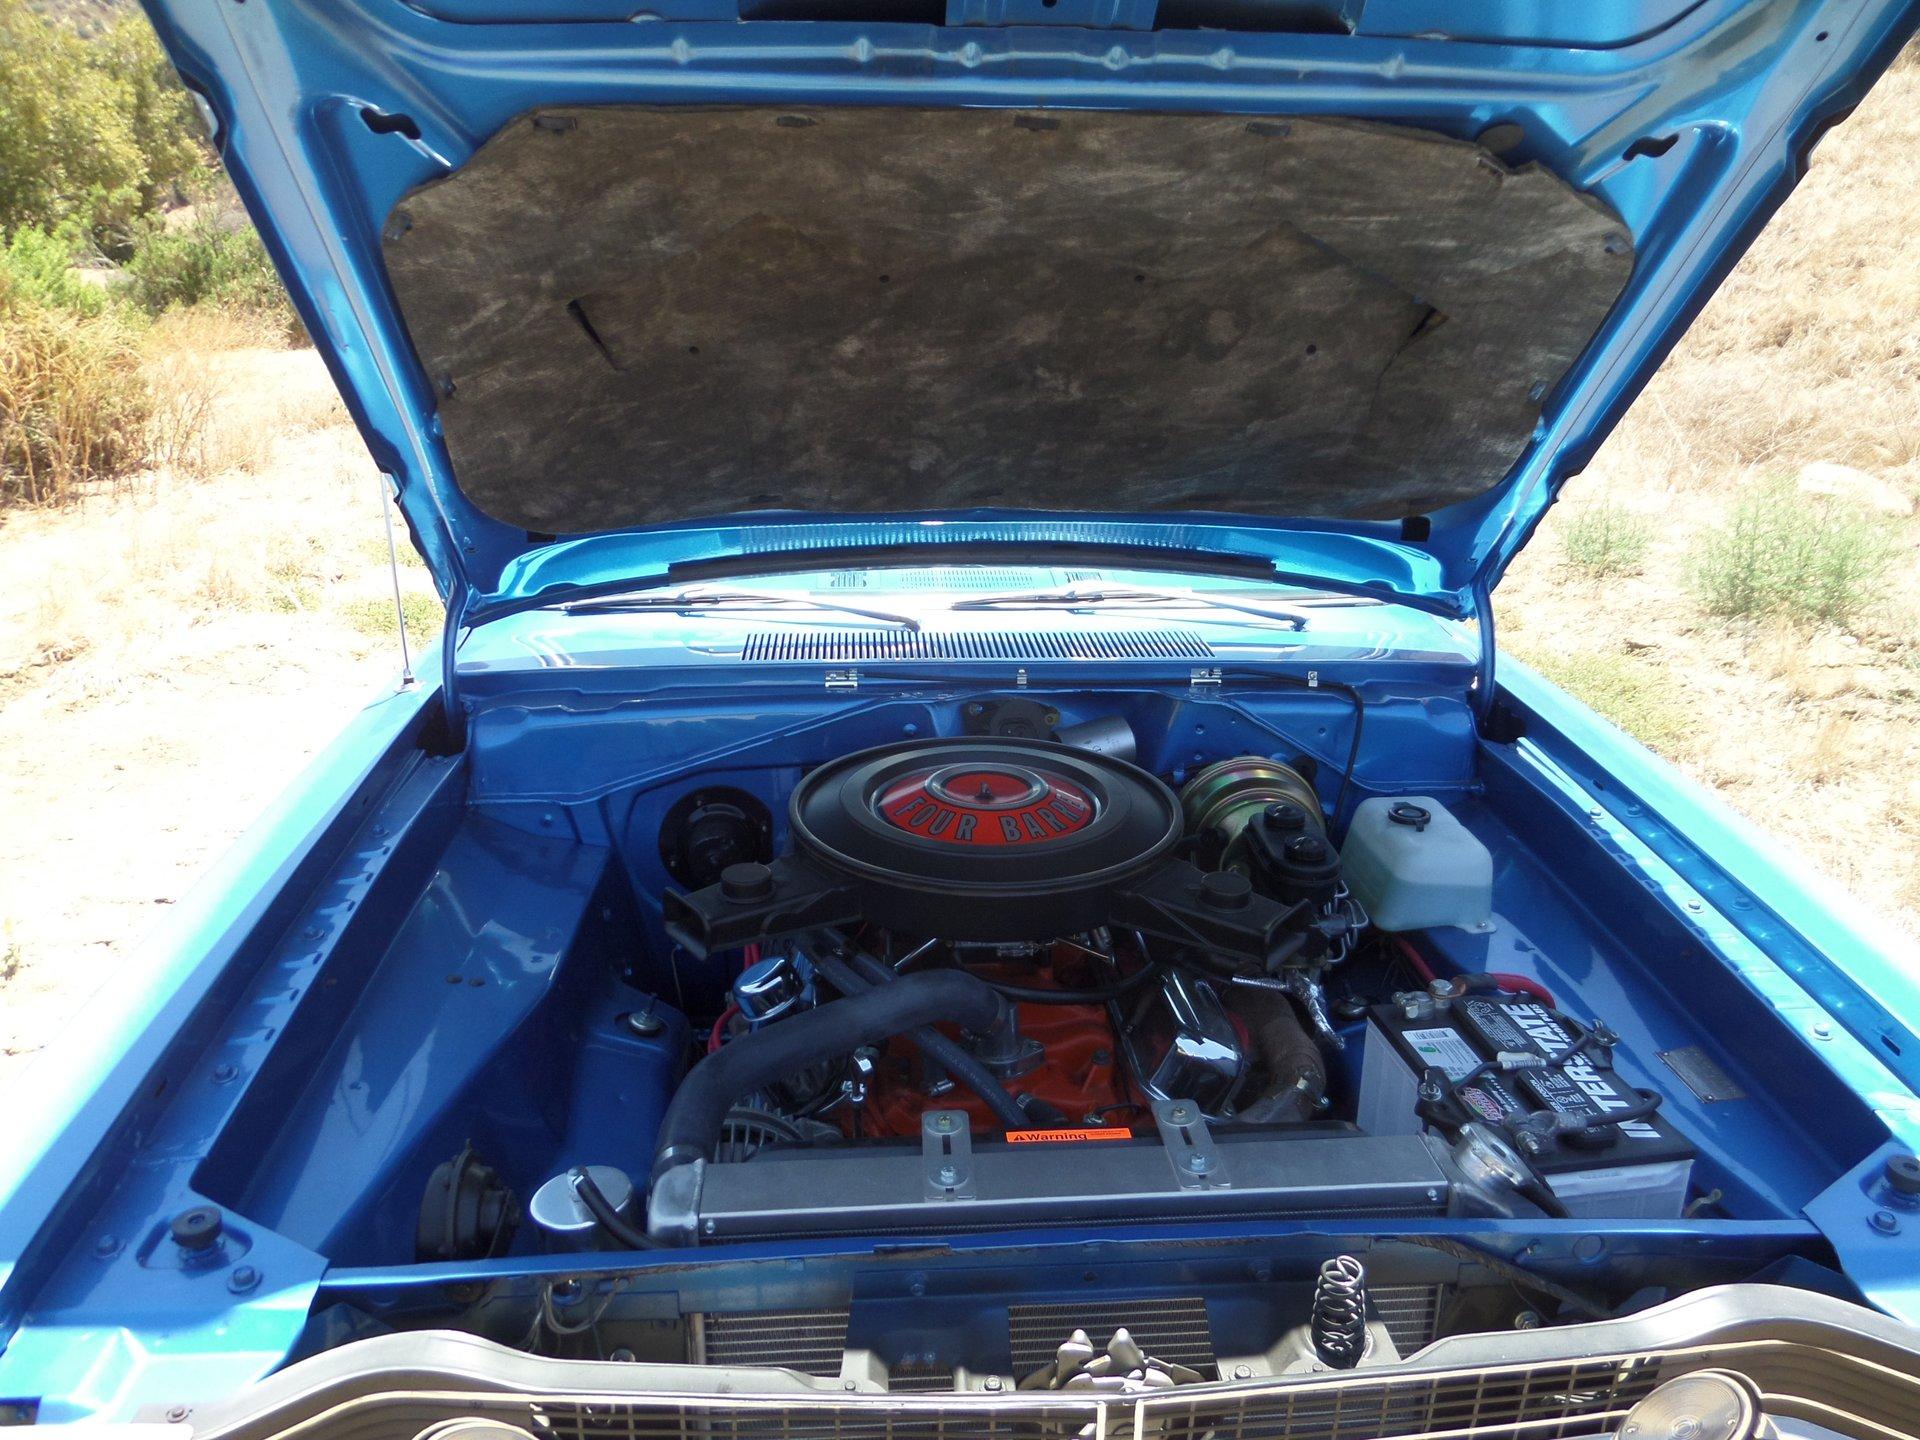 1968 Dodge Dart Laguna Classic Cars Automotive Art 1964 Gts